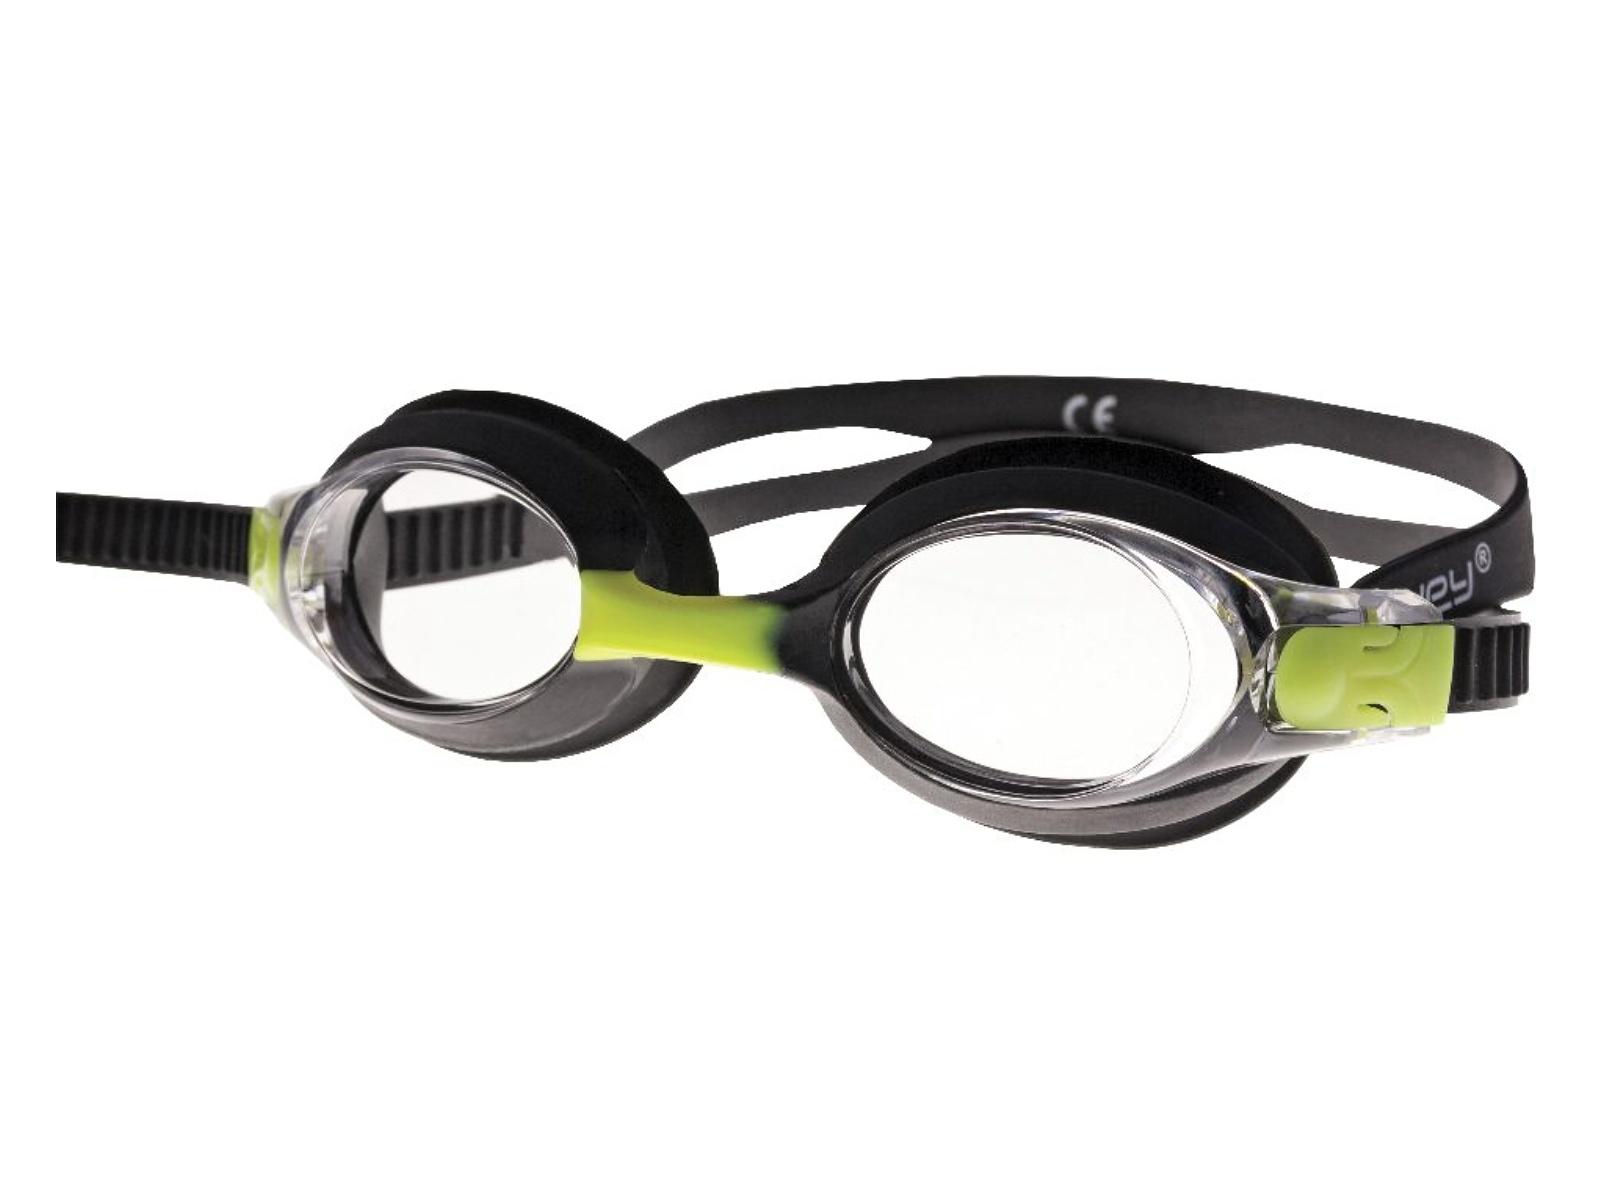 Plavecké brýle SPOKEY Mellon - černé